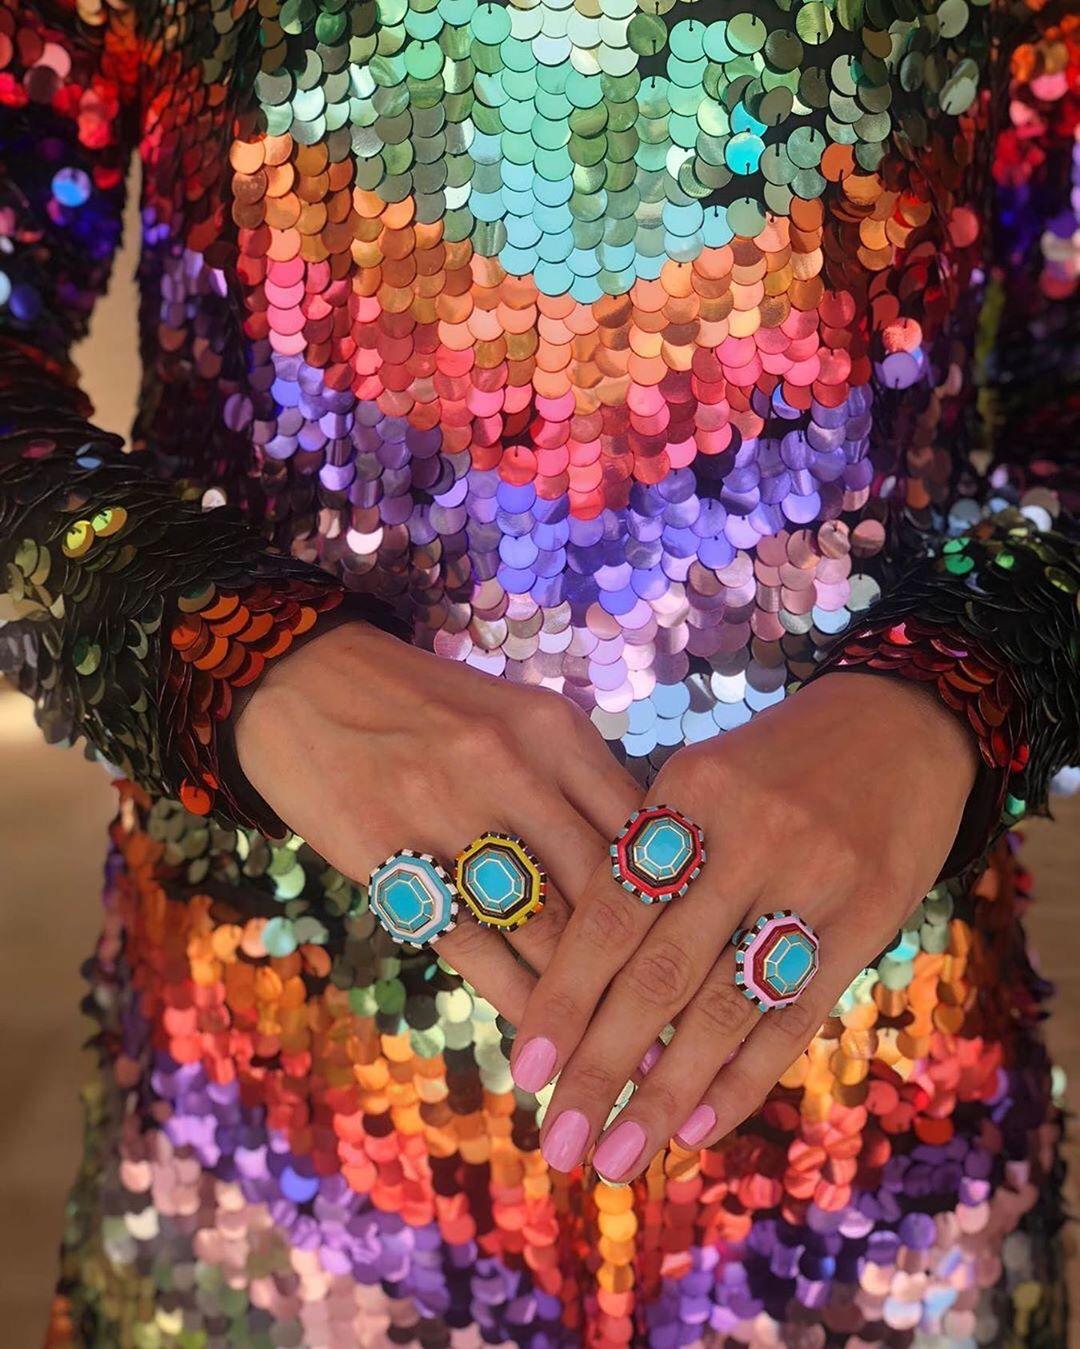 Rainbow Jumbo Hanging Sequin Dress With Long Sleeves.